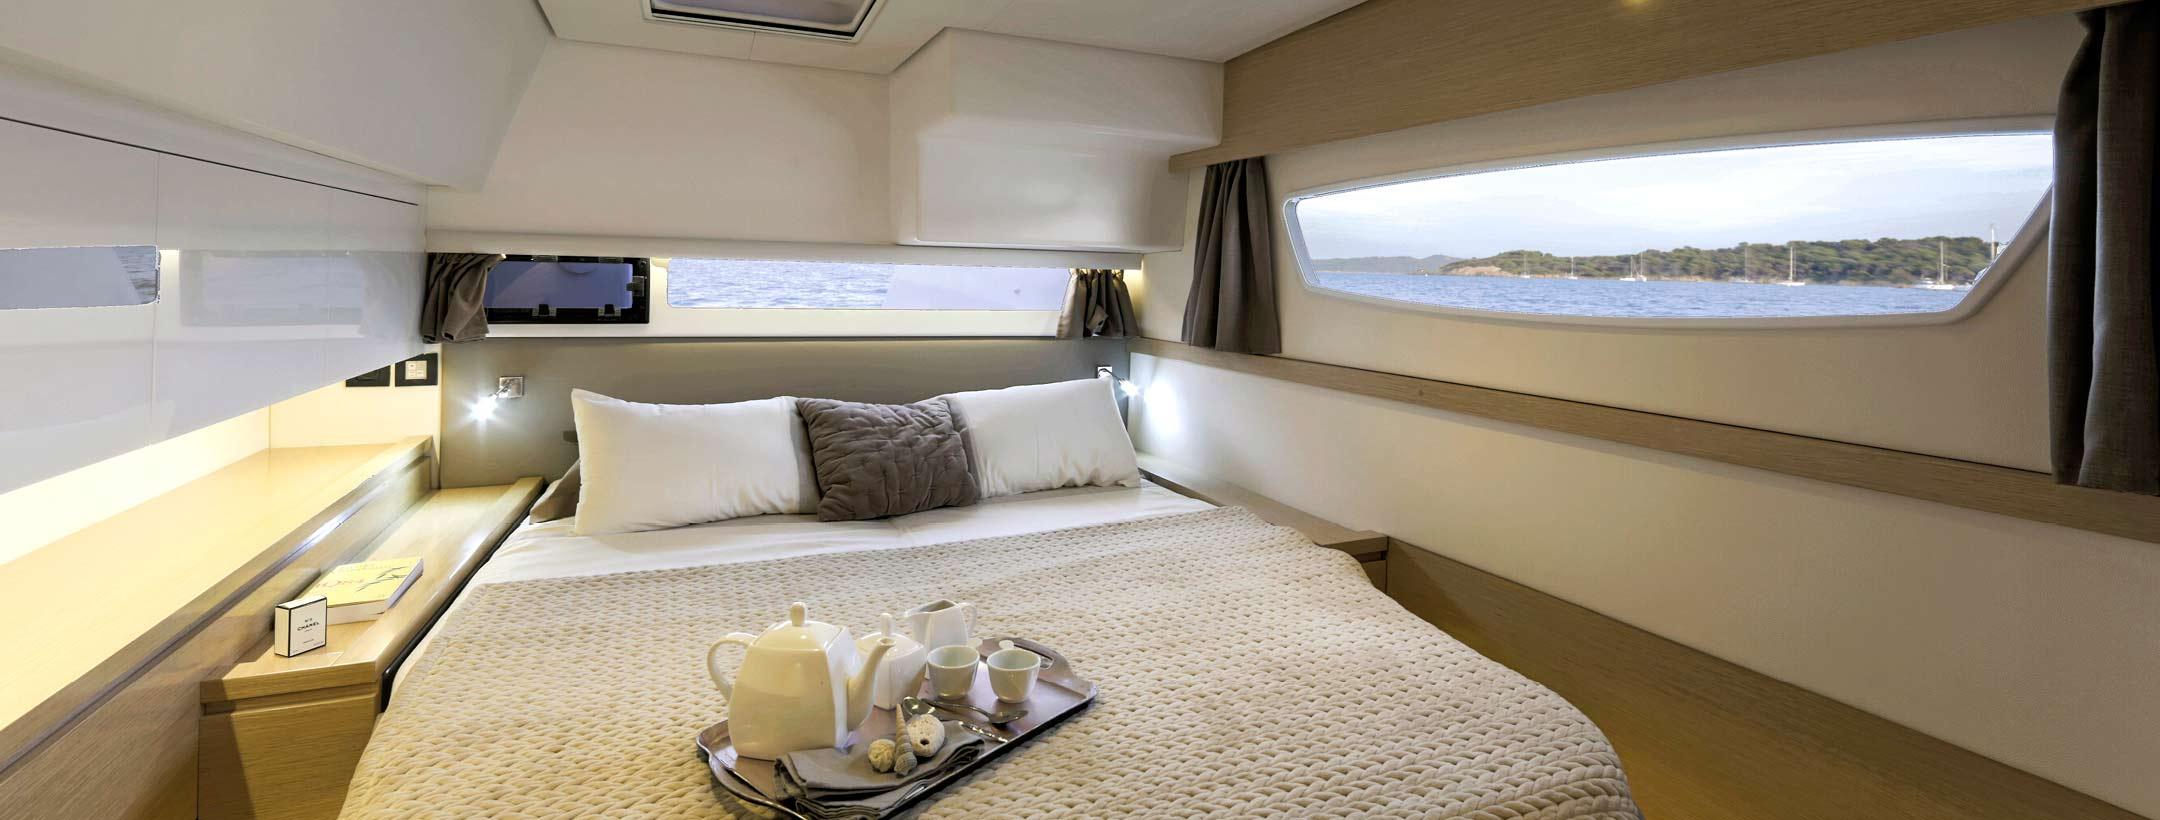 TradeWinds 52 Cruising Class Yacht cabin 1